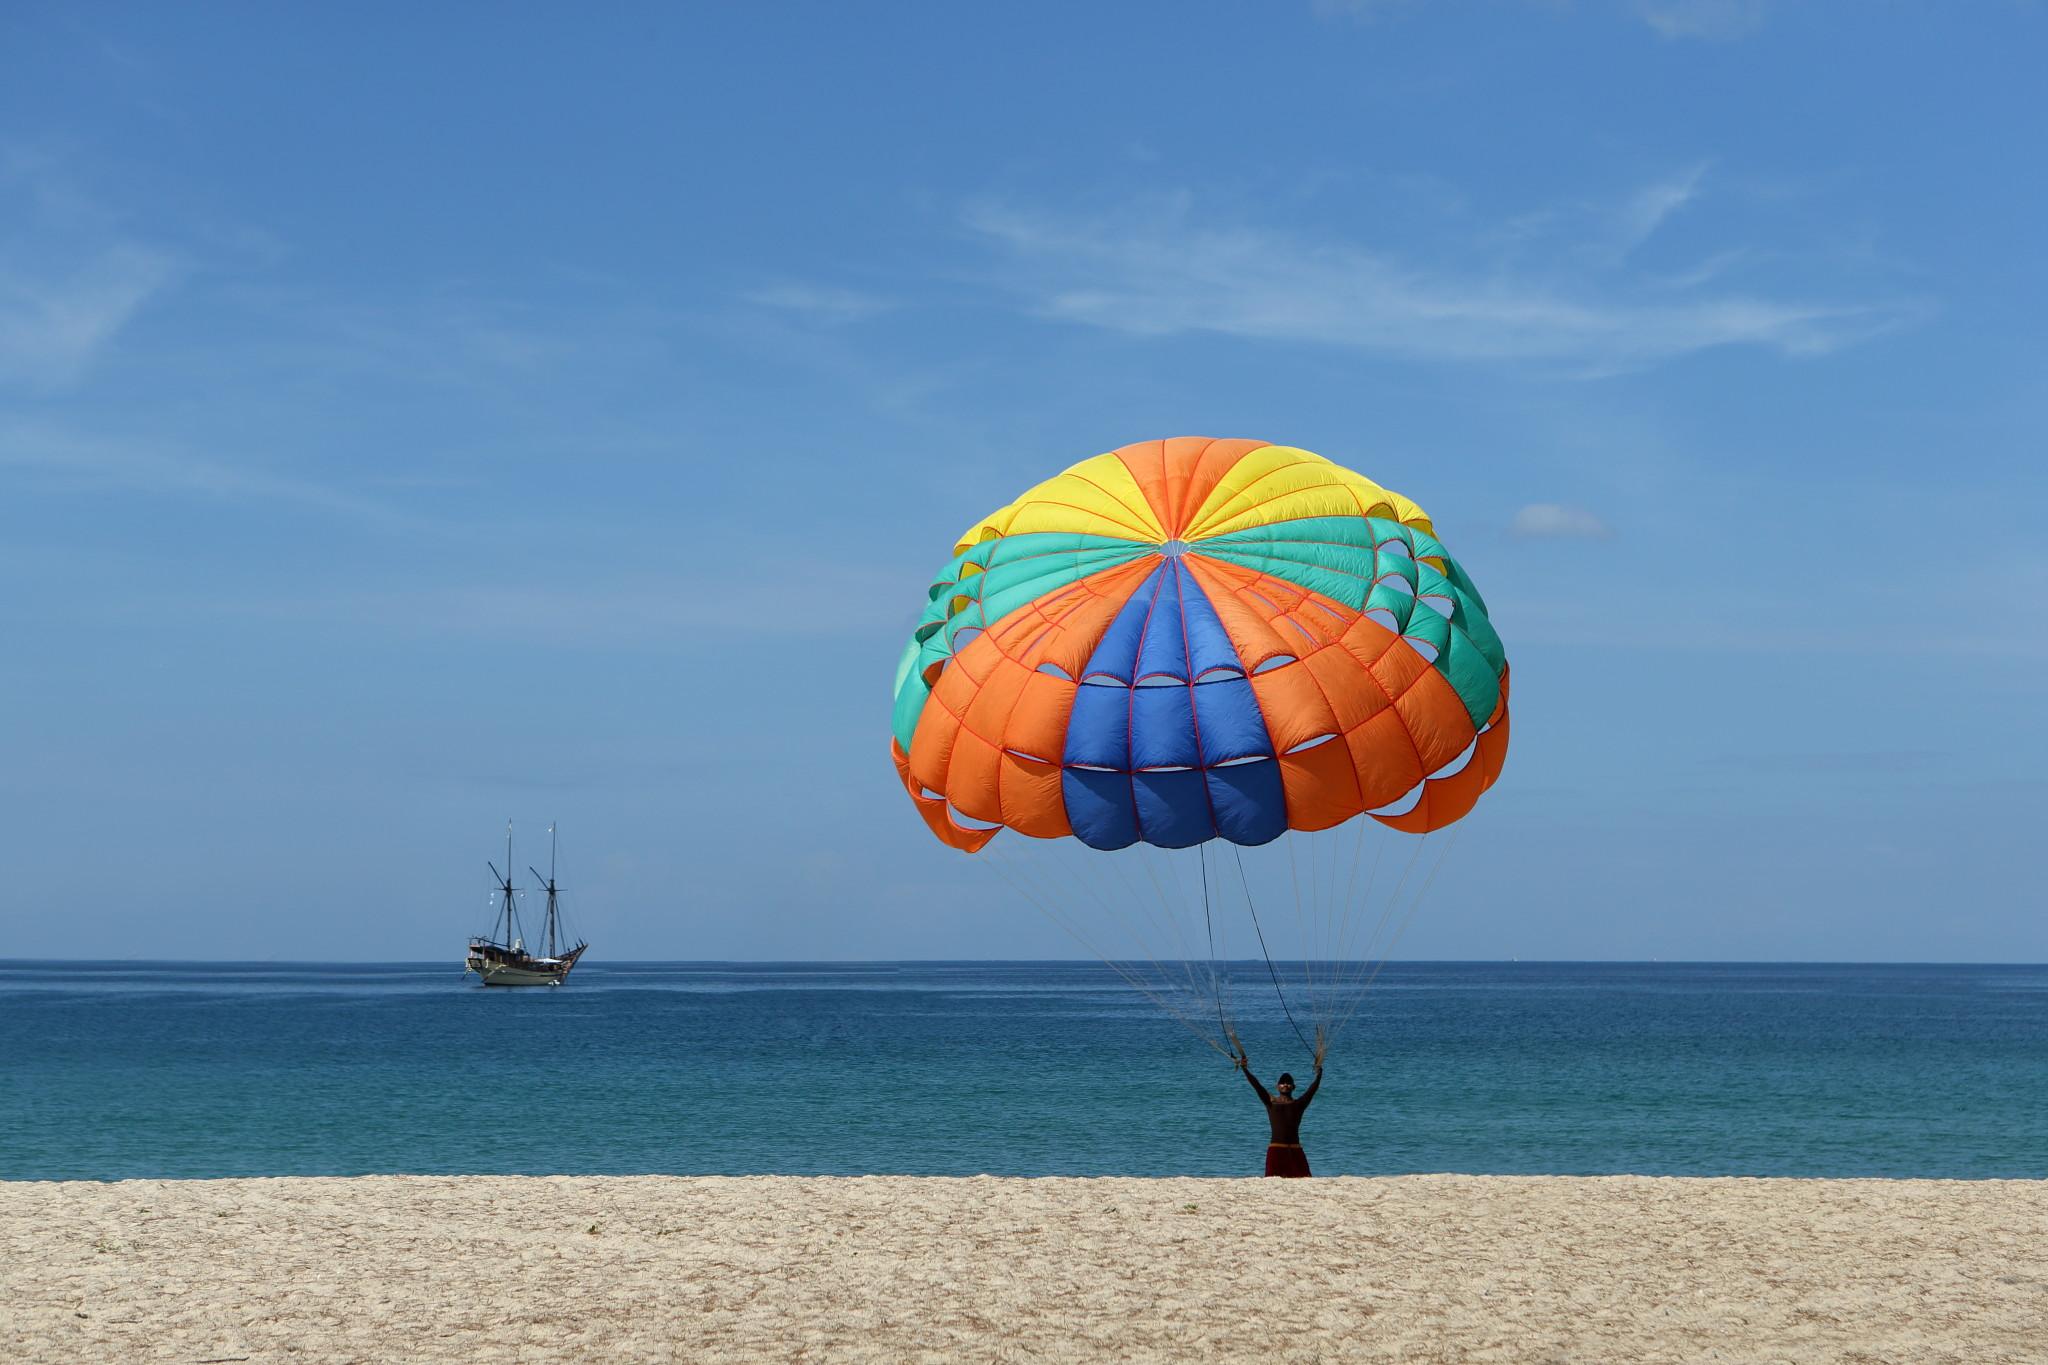 14. Beach Activity